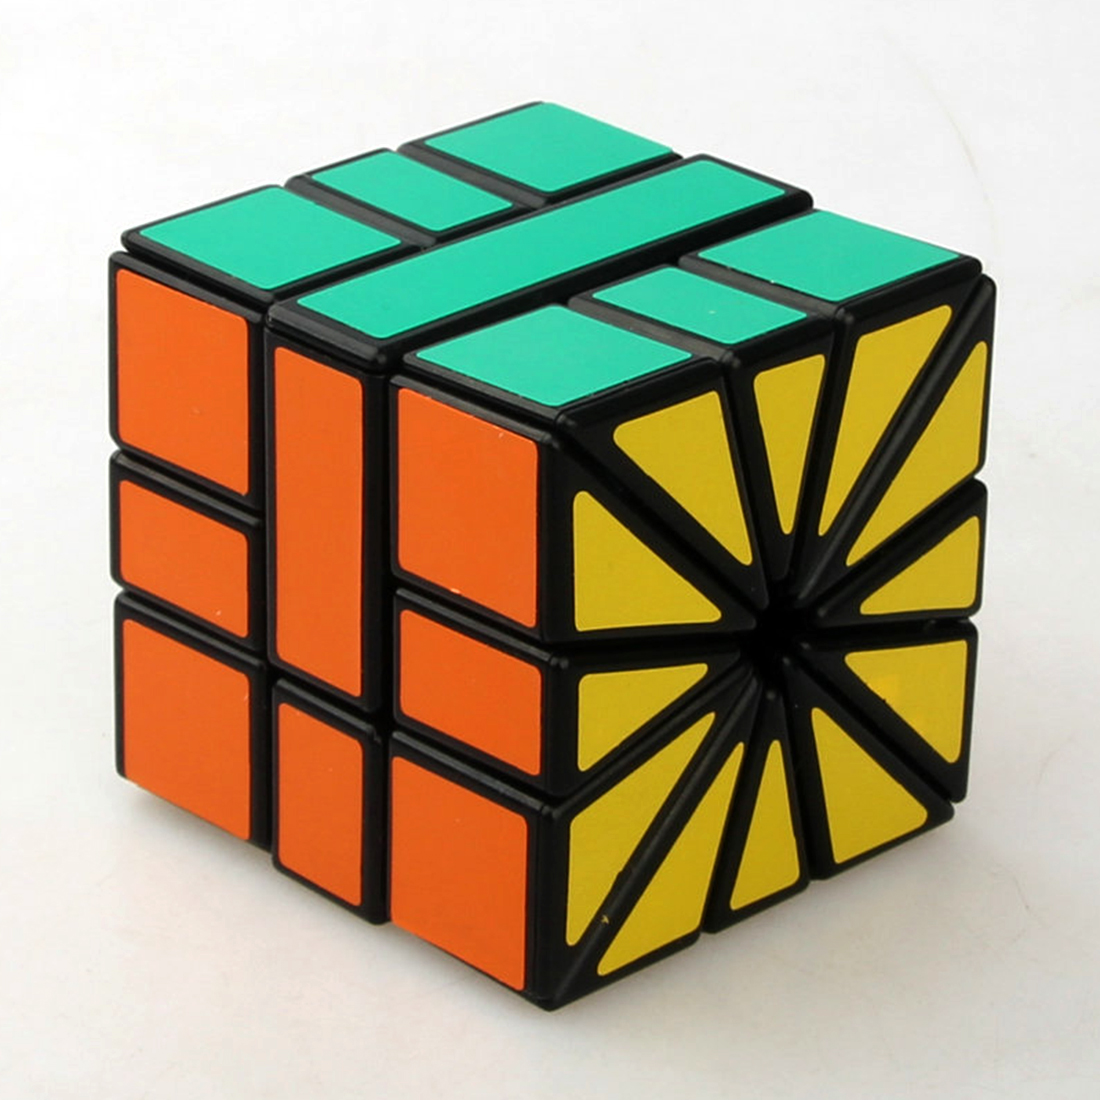 Square II SQ2 3x3x3 Speed Cube Magic Cube Puzzle Toy - Black